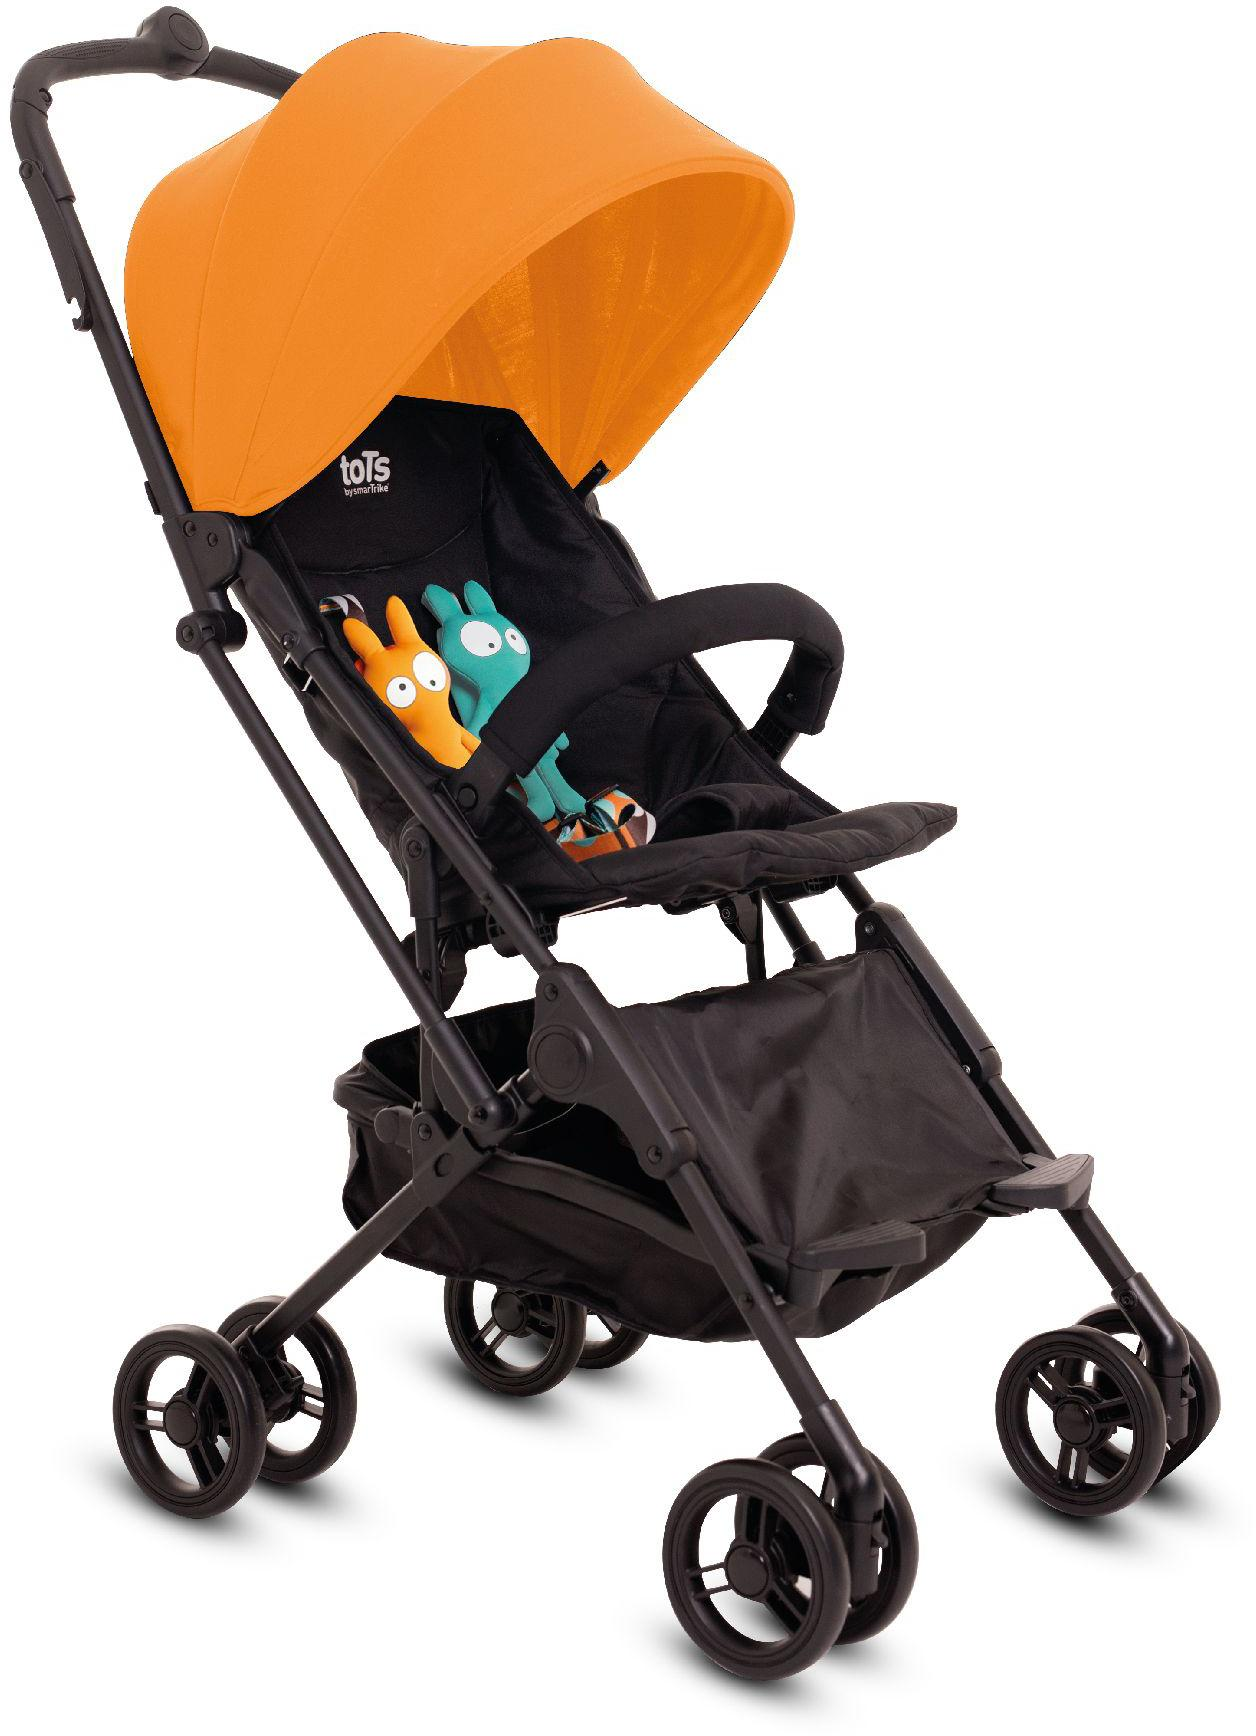 smarTrike Kinder-Buggy toTs Minimi Buggy, orange schwarz Kinder Sitzbuggys Buggys Kinderwagen Buggies